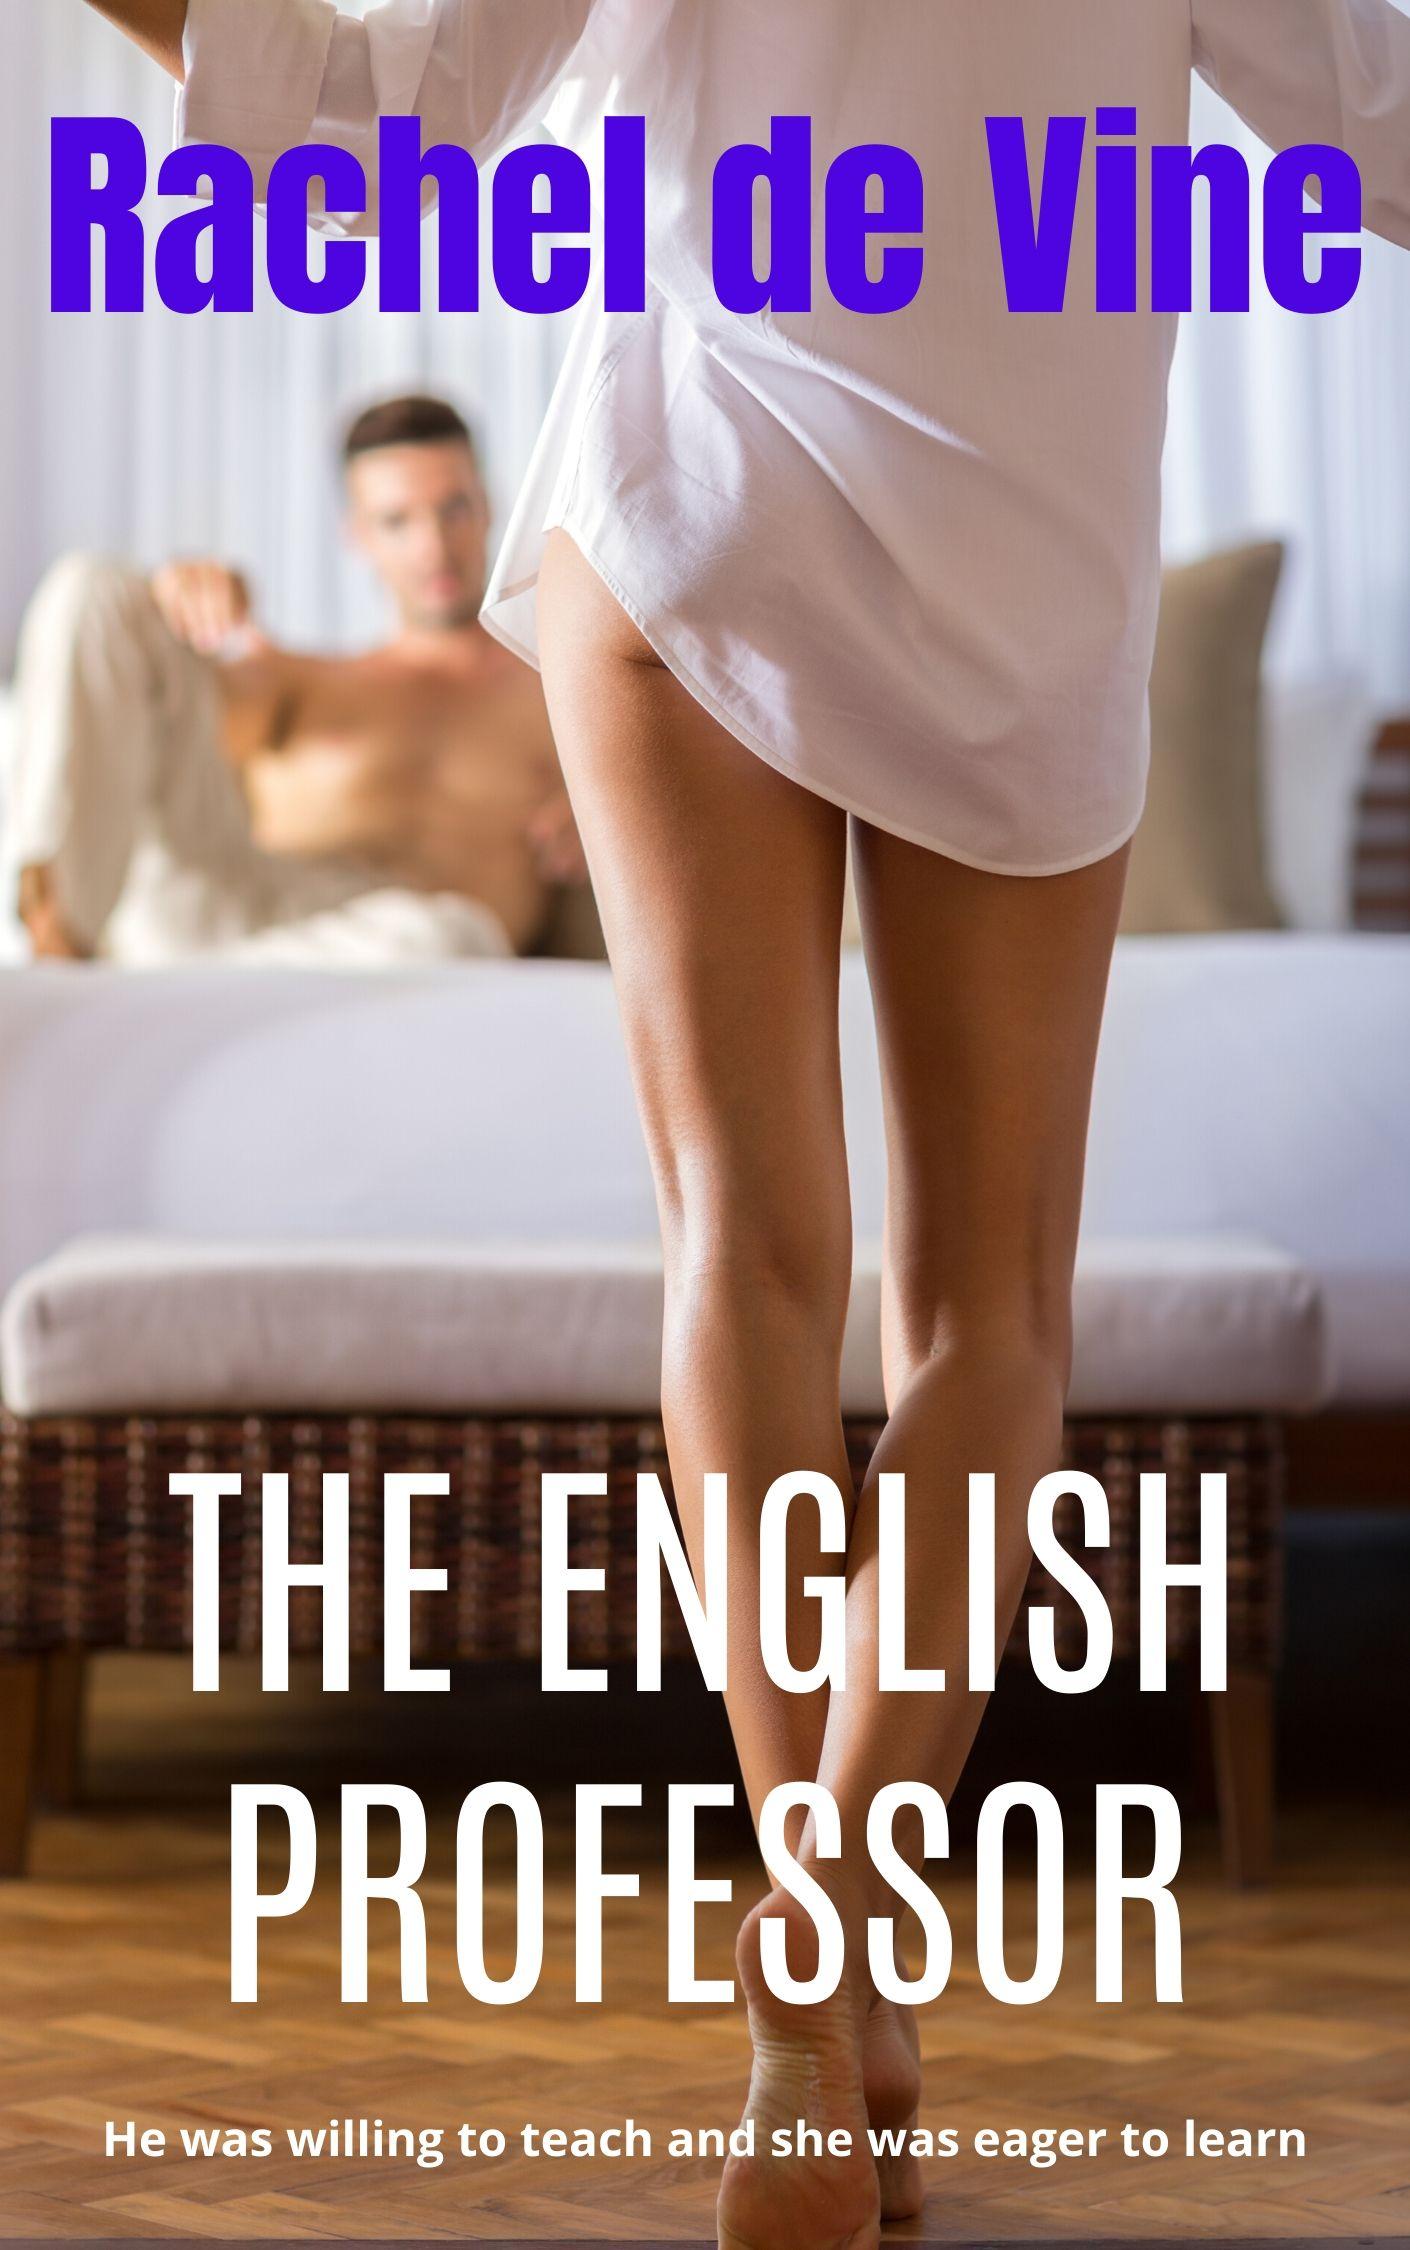 THE ENGLISH PROFESSOR COVER JPG.jpg